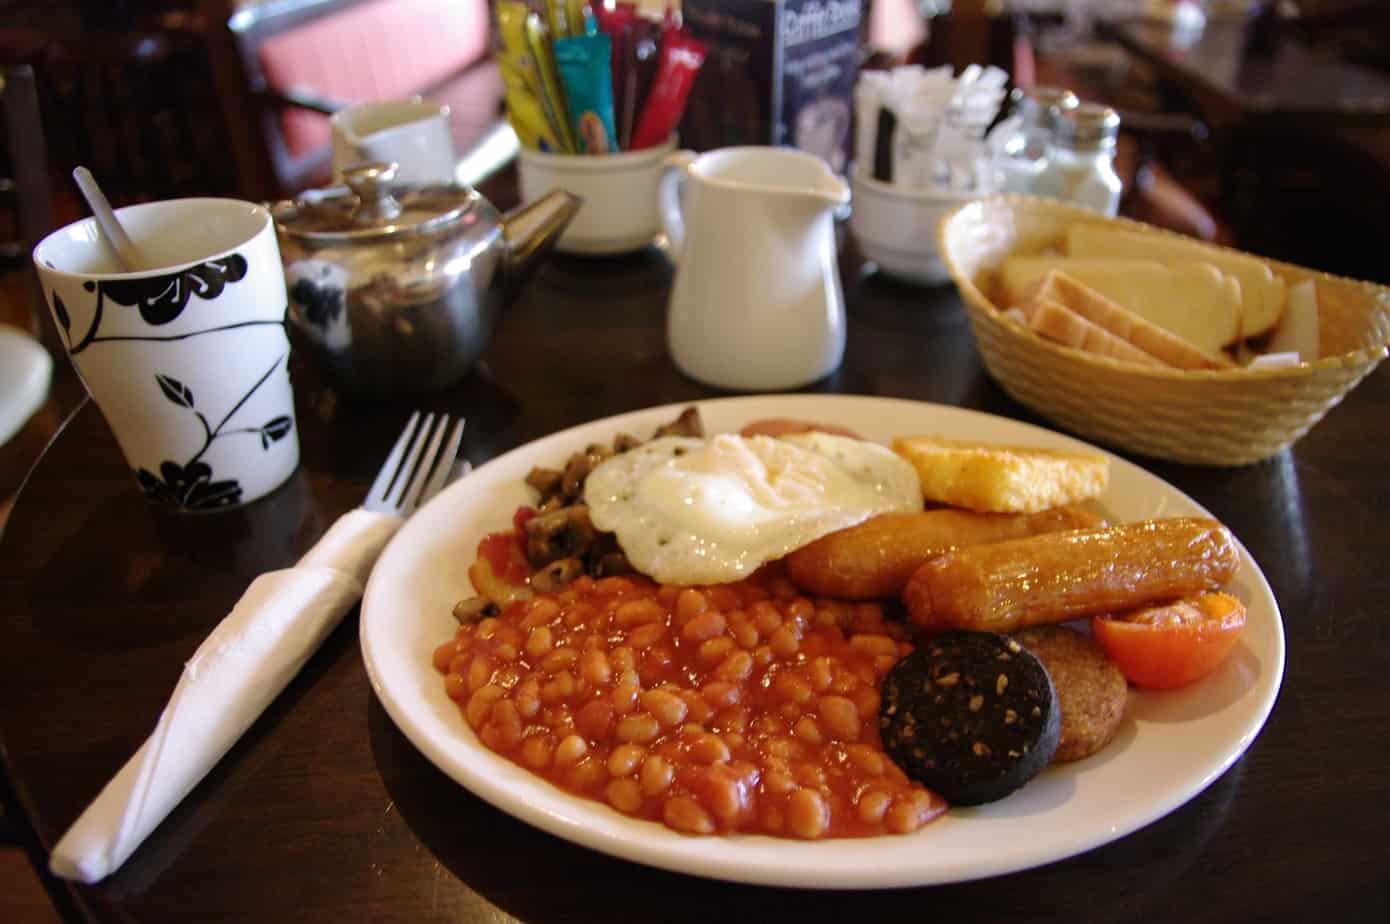 Full Irish breakfast in Kilkenny